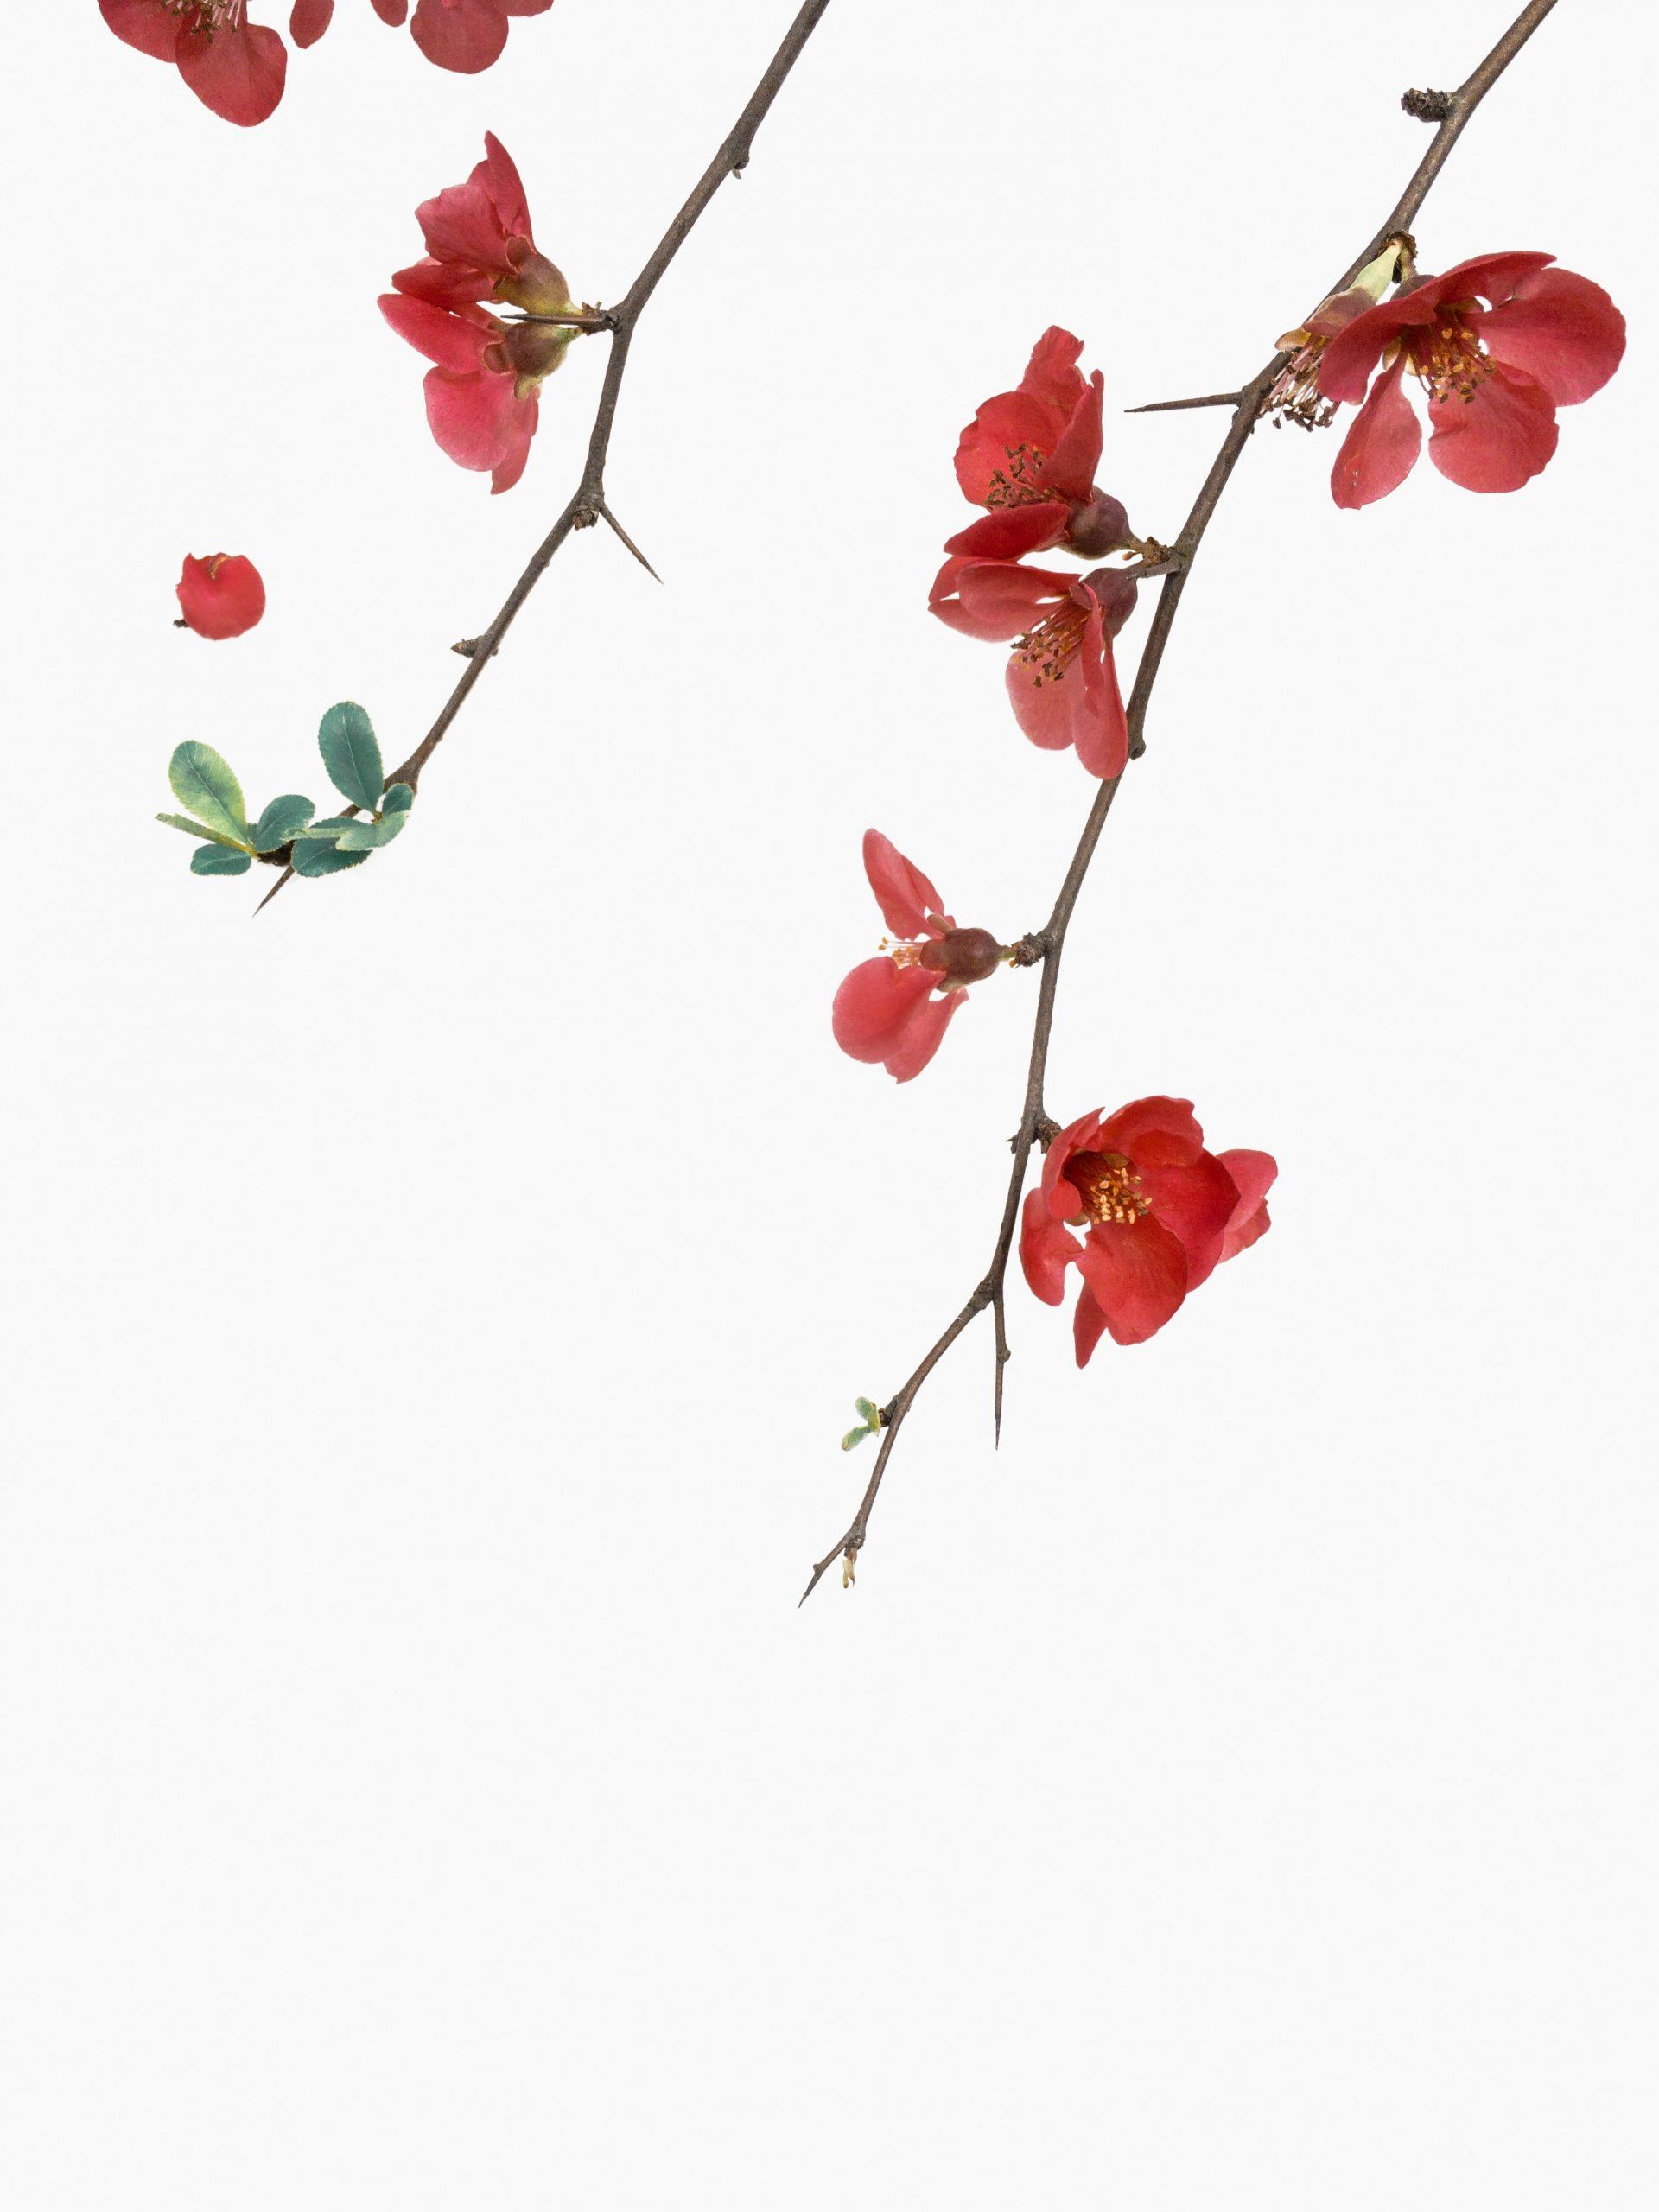 han-chenxu-543979-unsplash